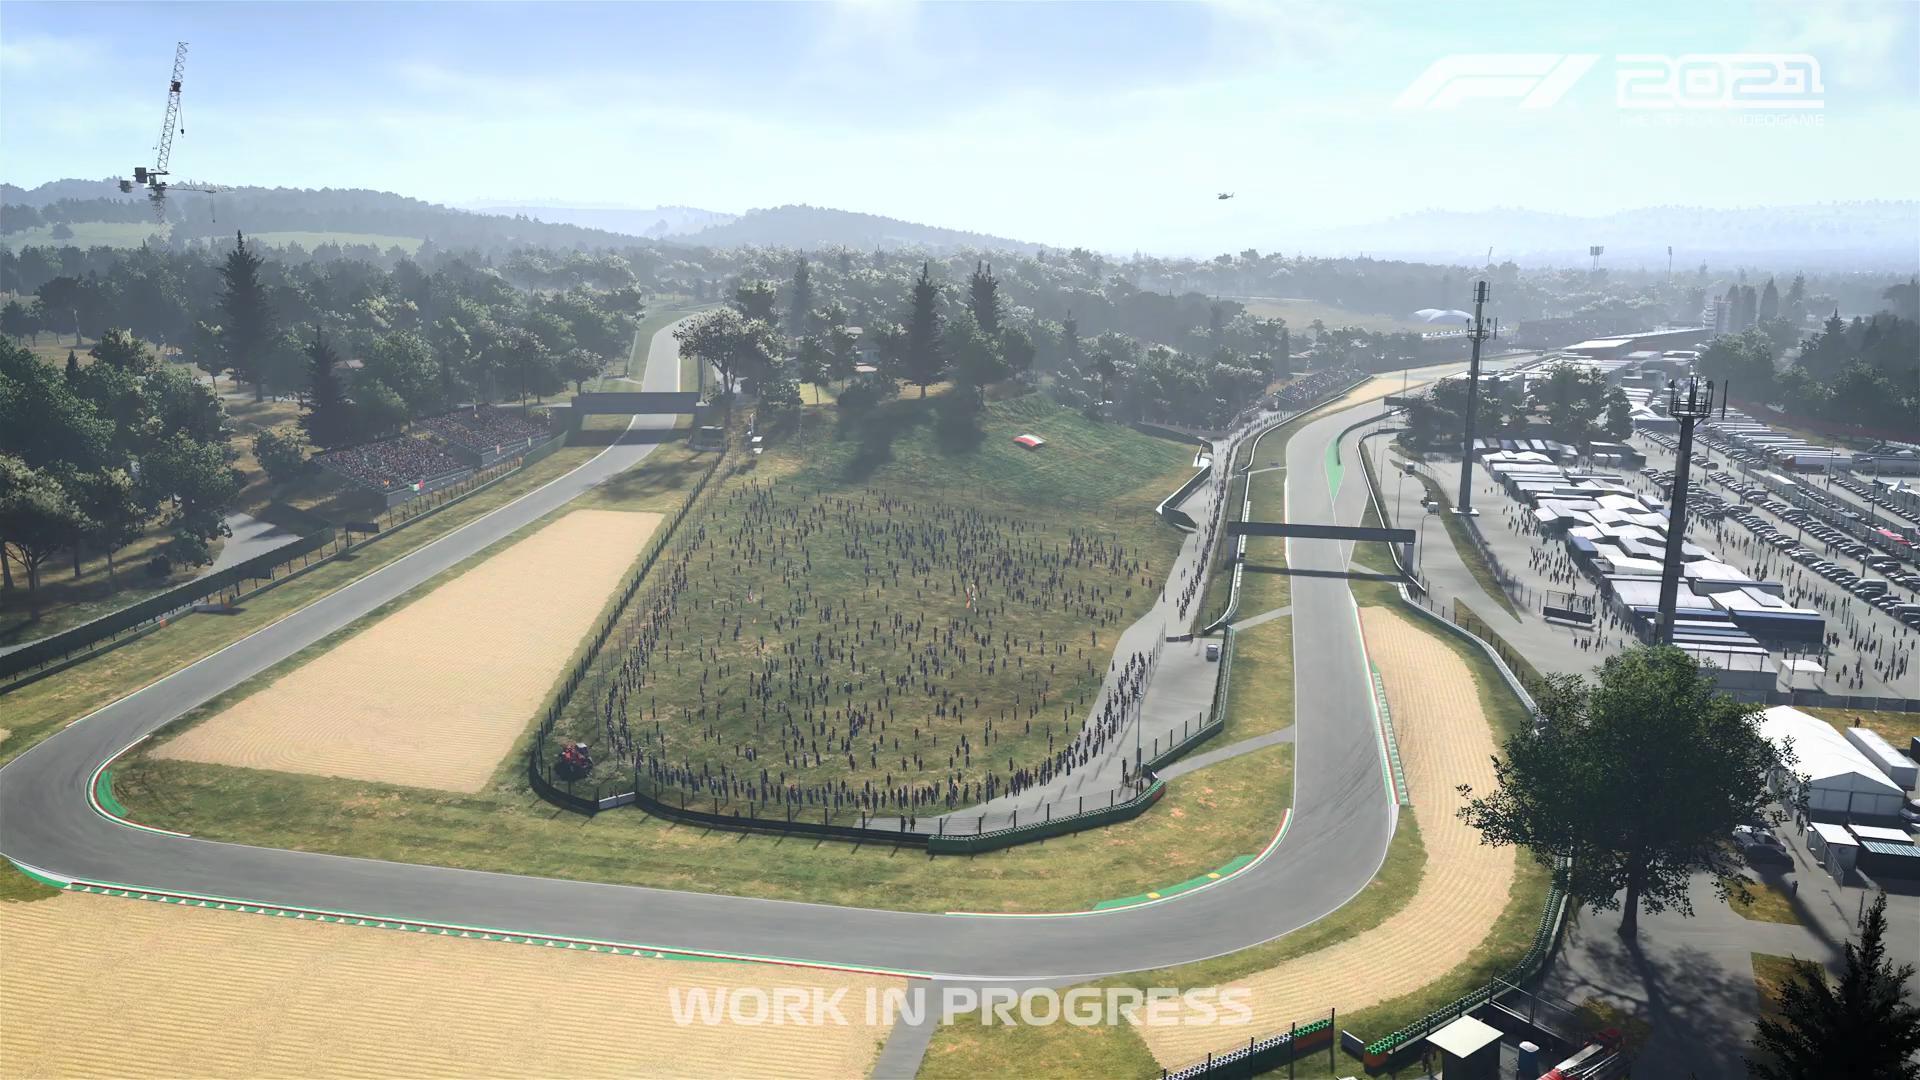 《F1 2021》发布免费更新 新赛道Portimao上线